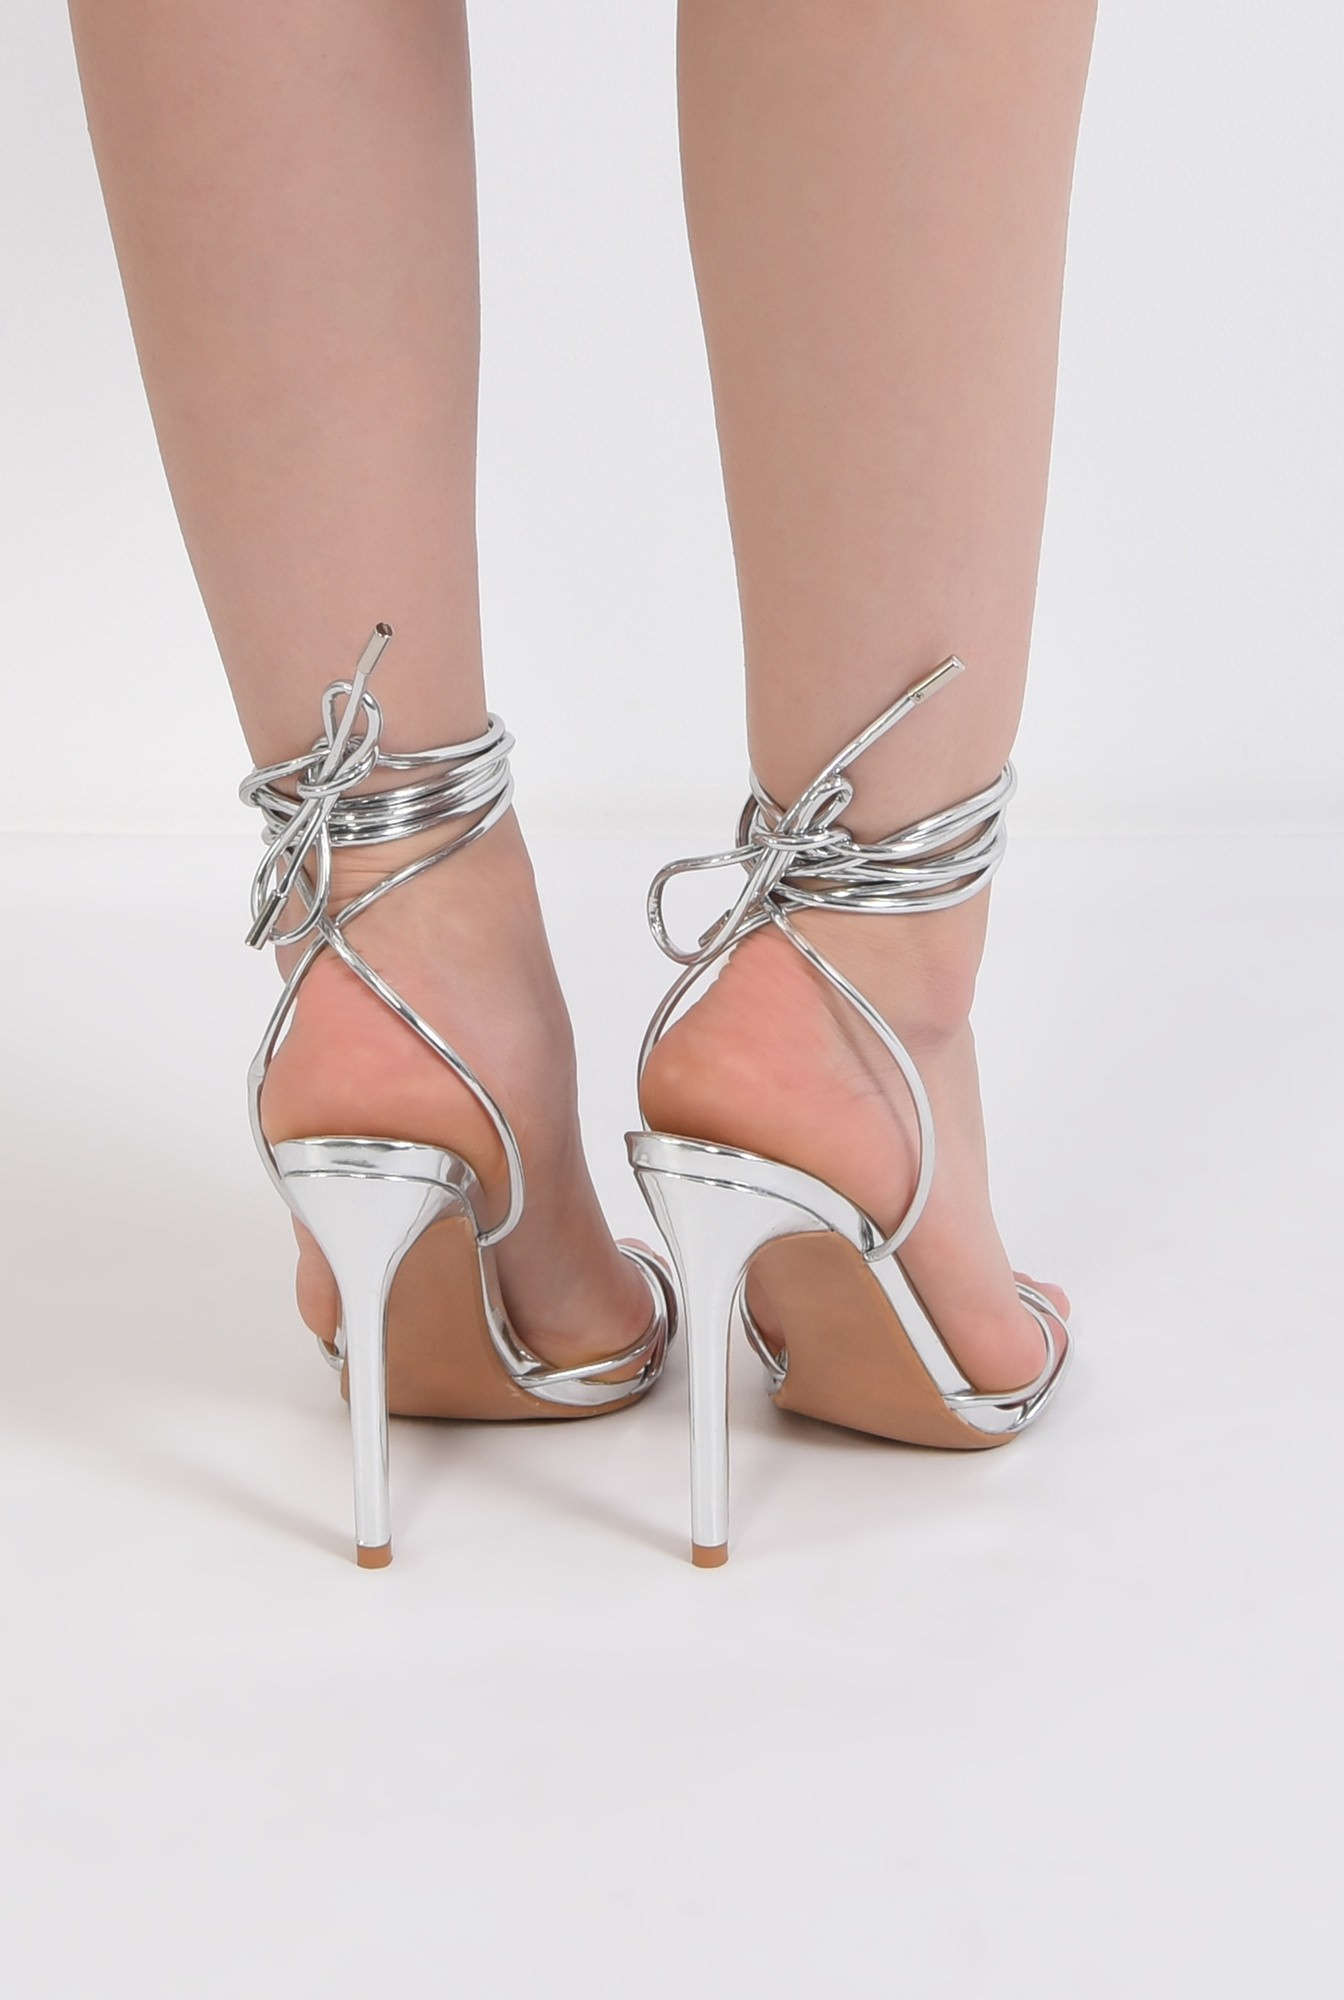 2 - sandale elegante, argintii, cu snur, stiletto